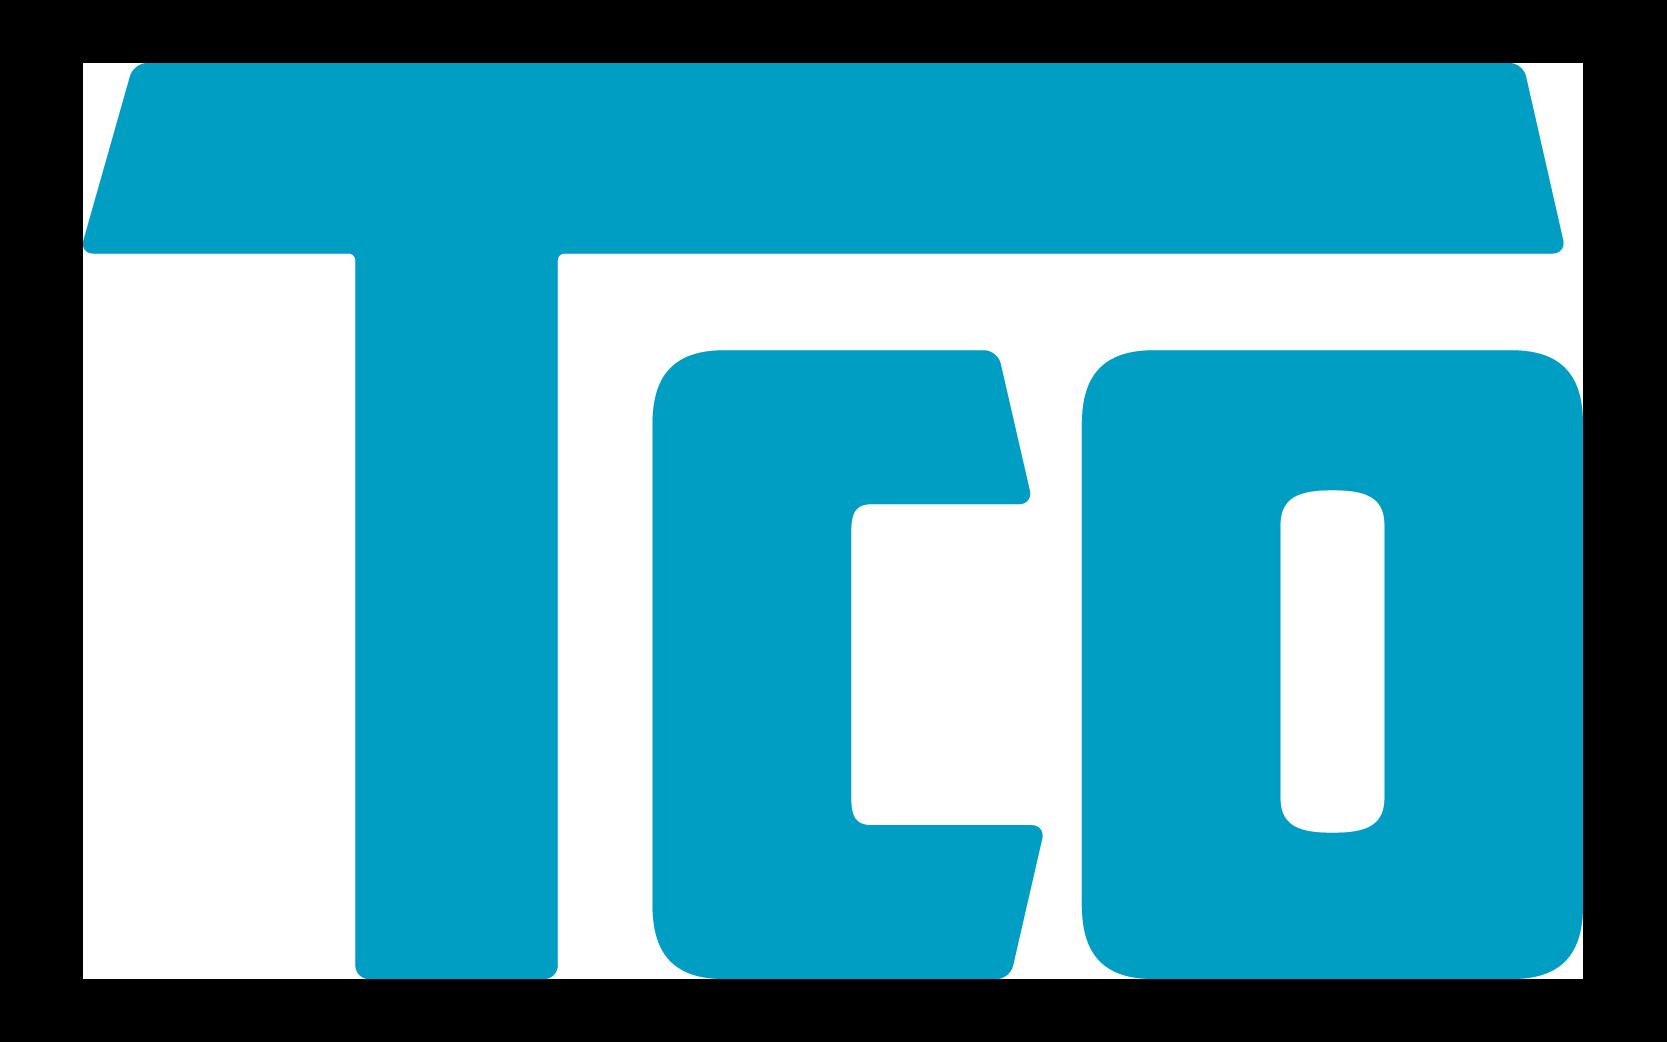 Logotyp för TCO